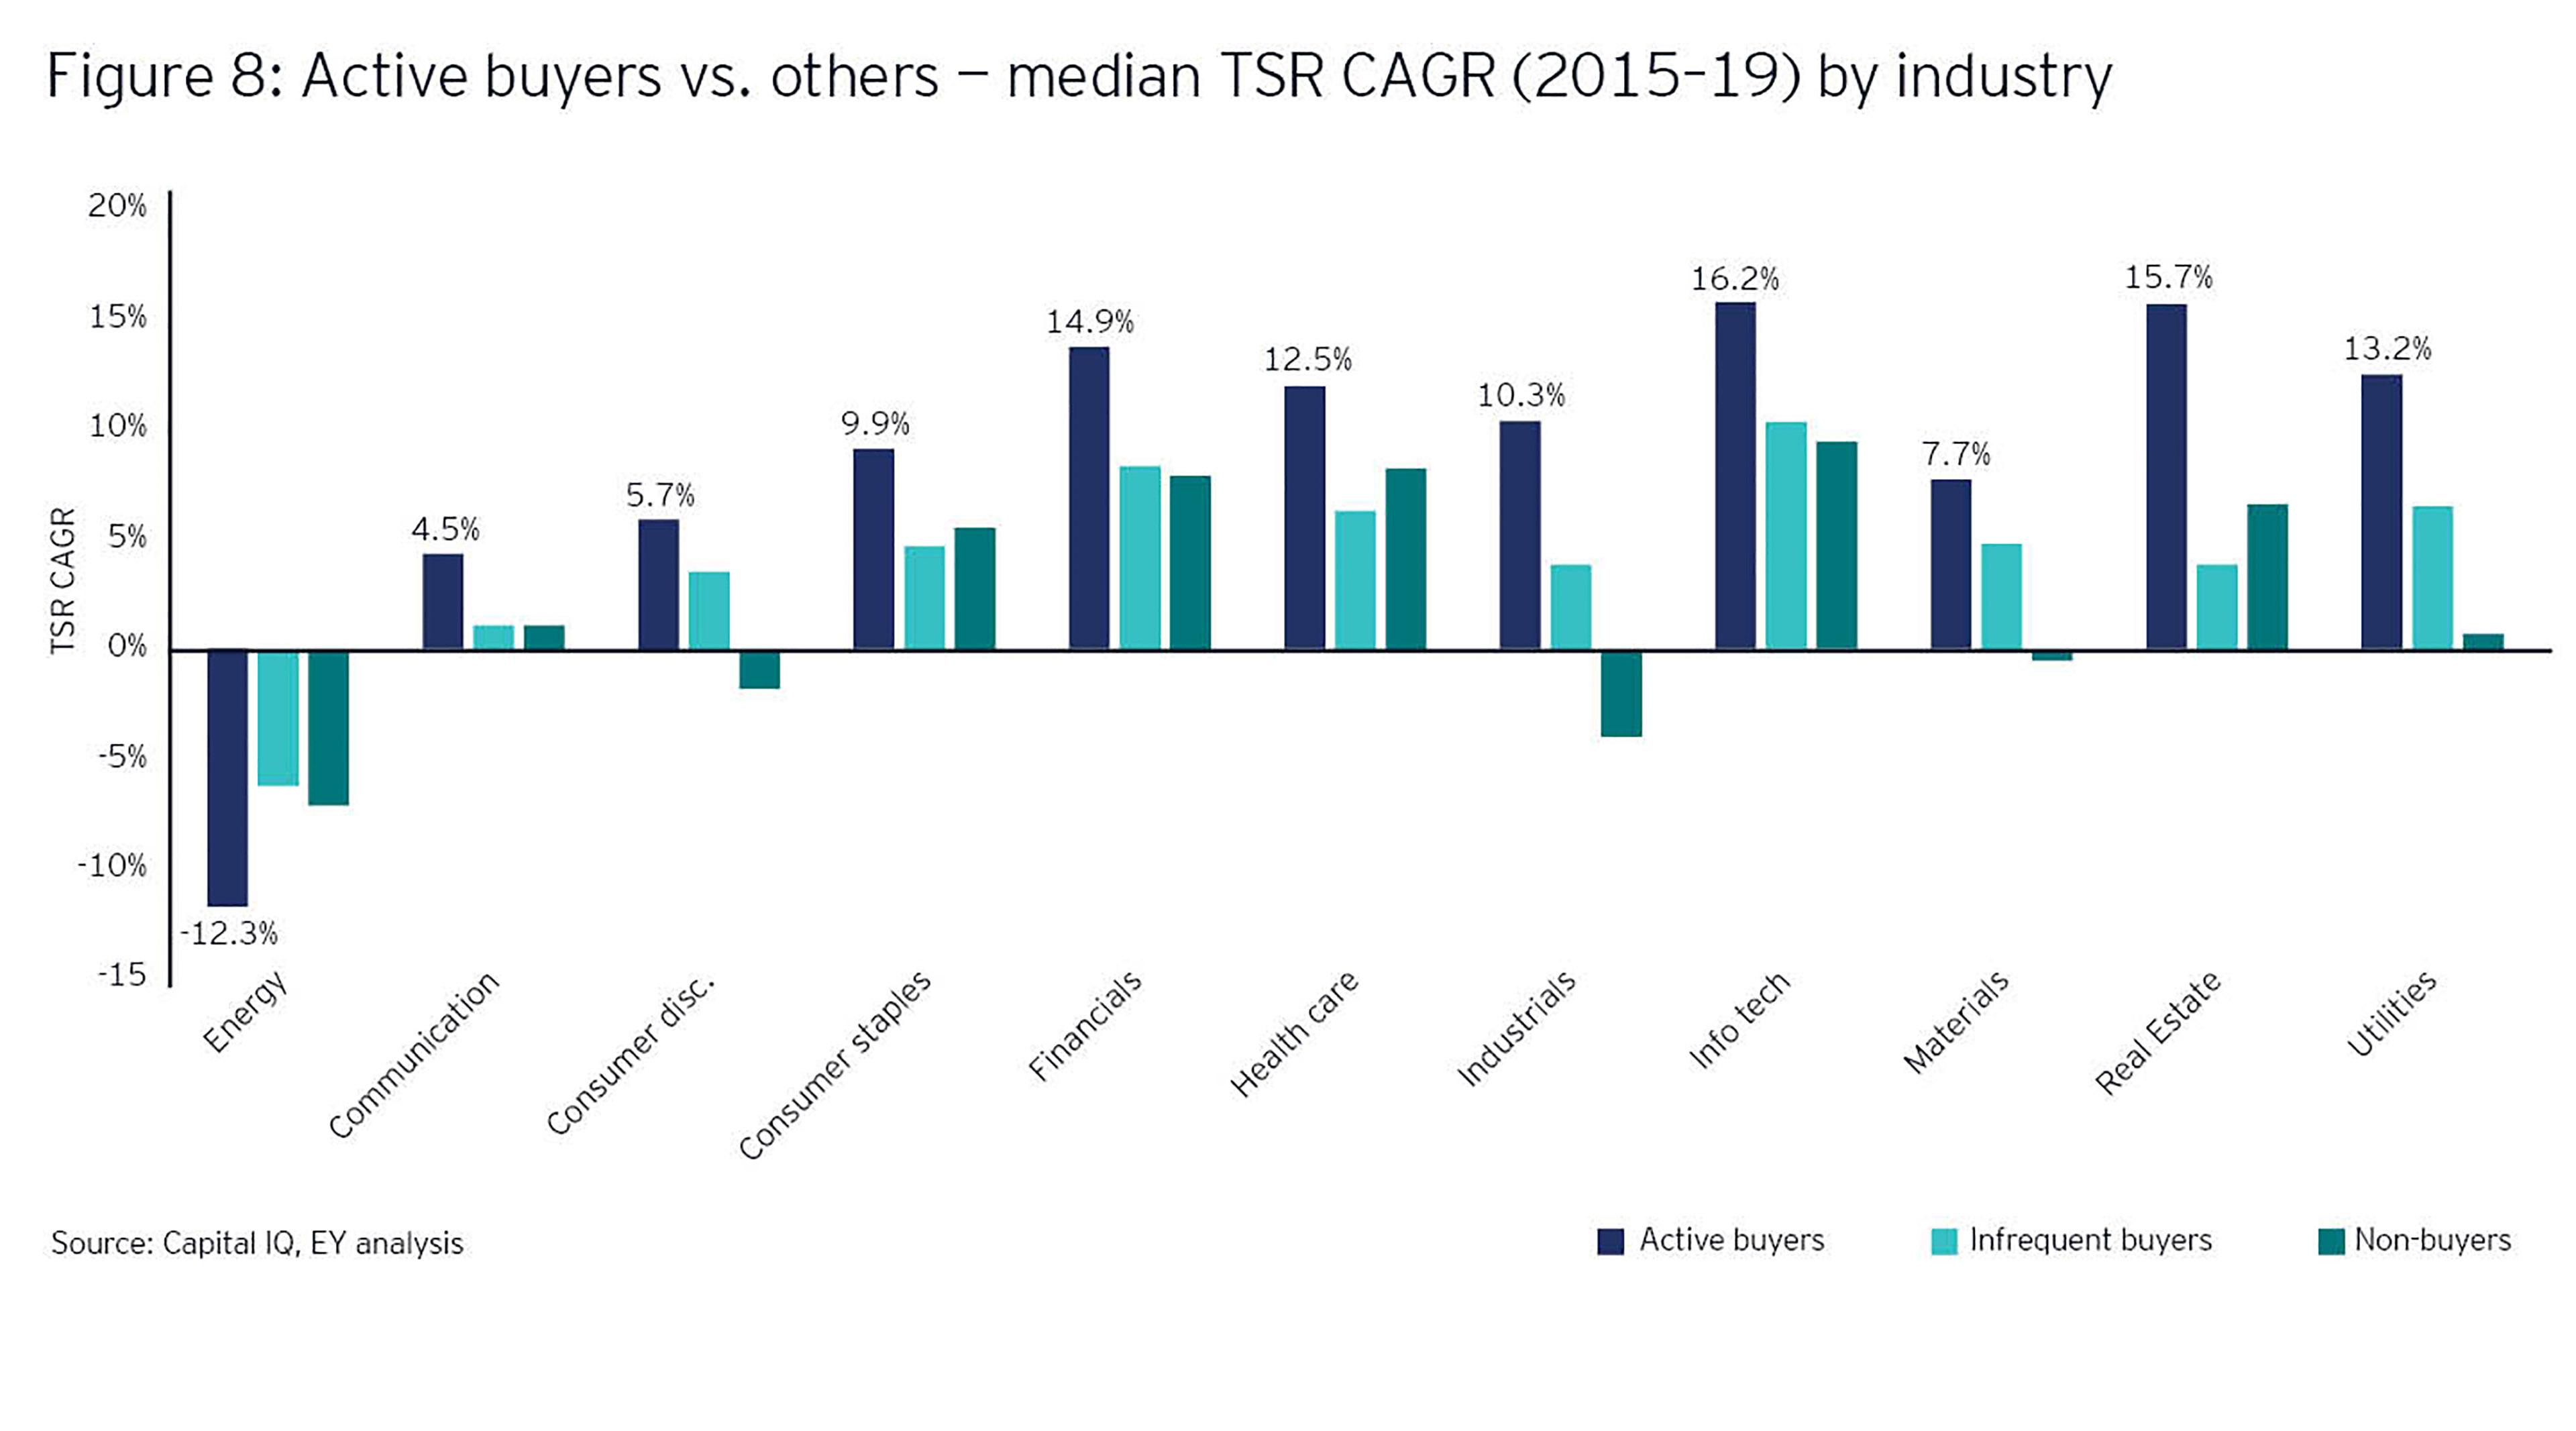 Acitve buyers vs. others median TSR CAGR